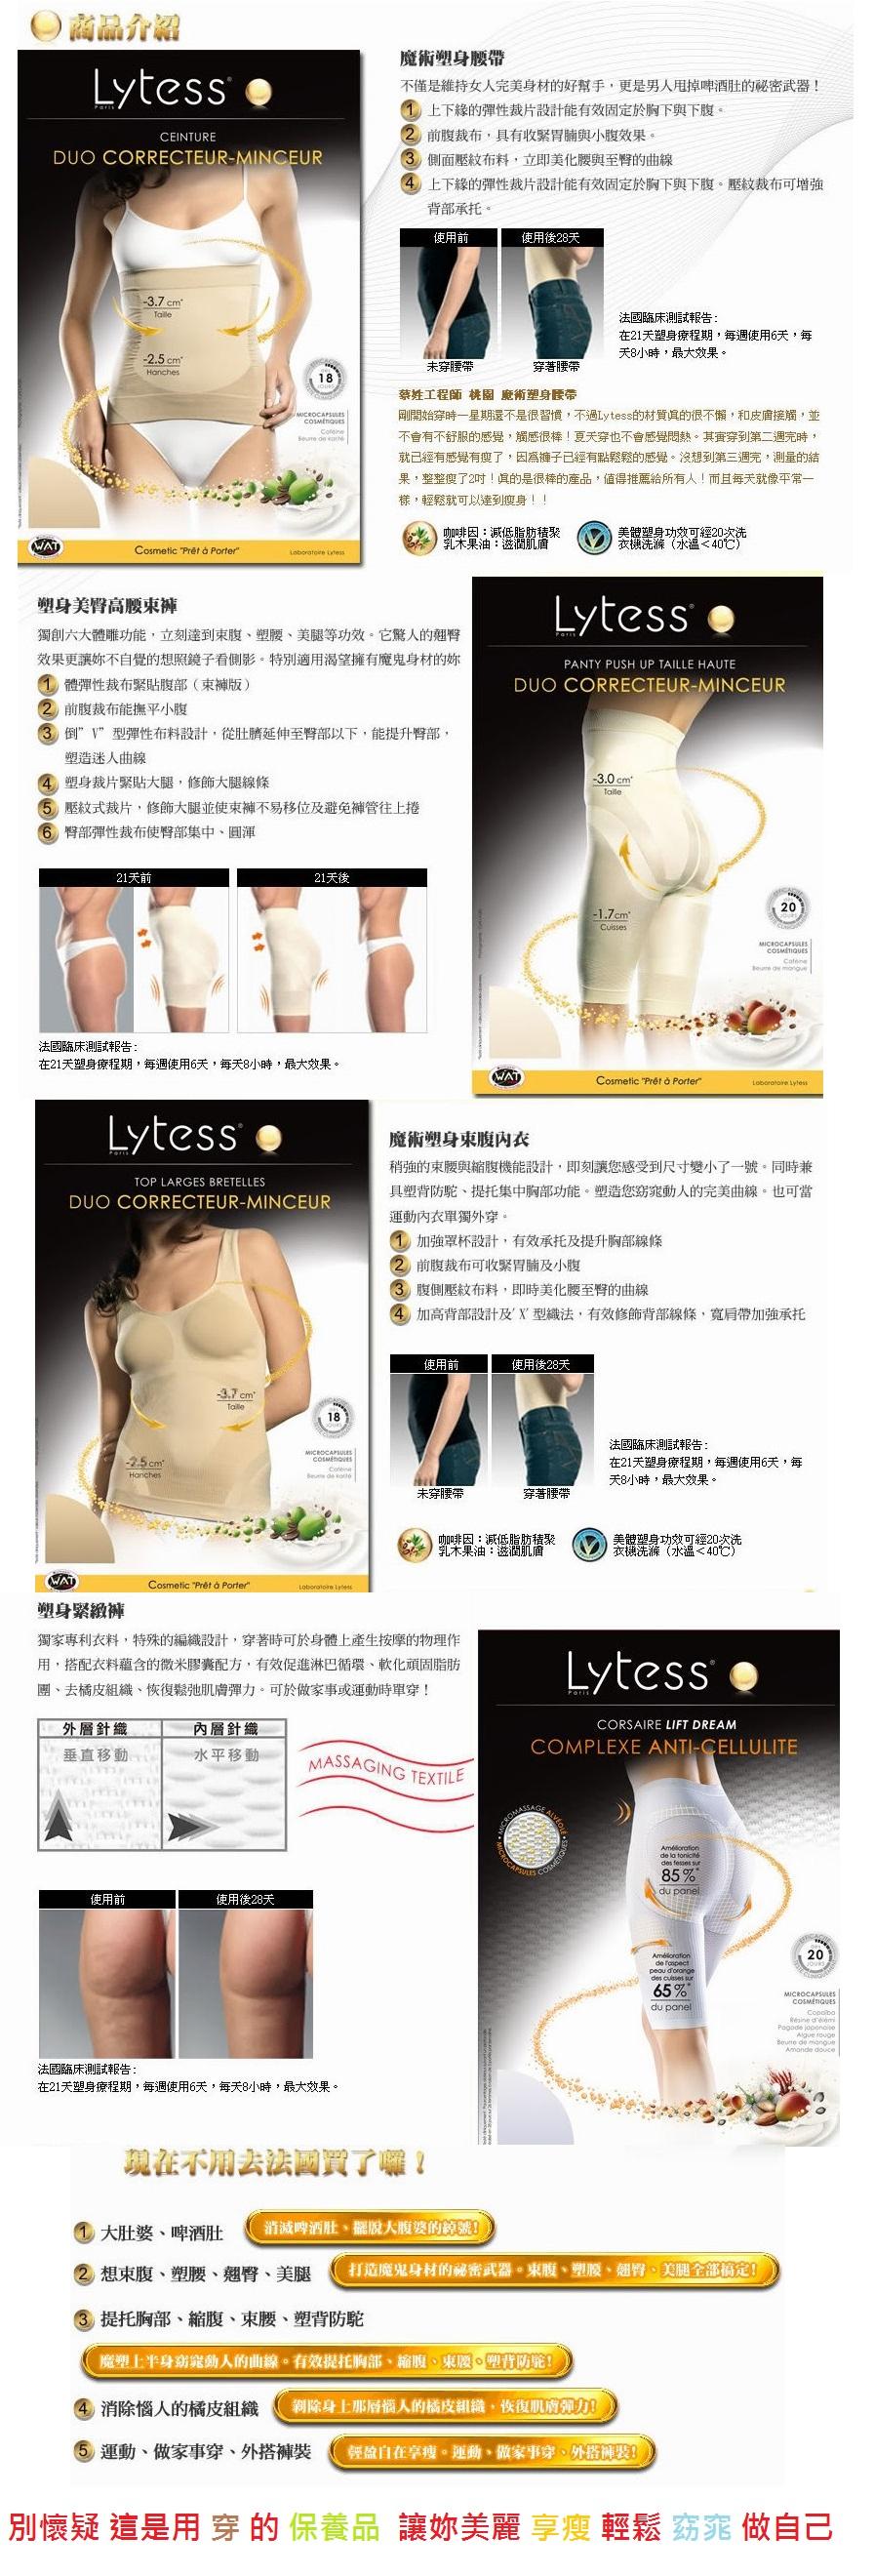 Lytess塑身衣褲 文案